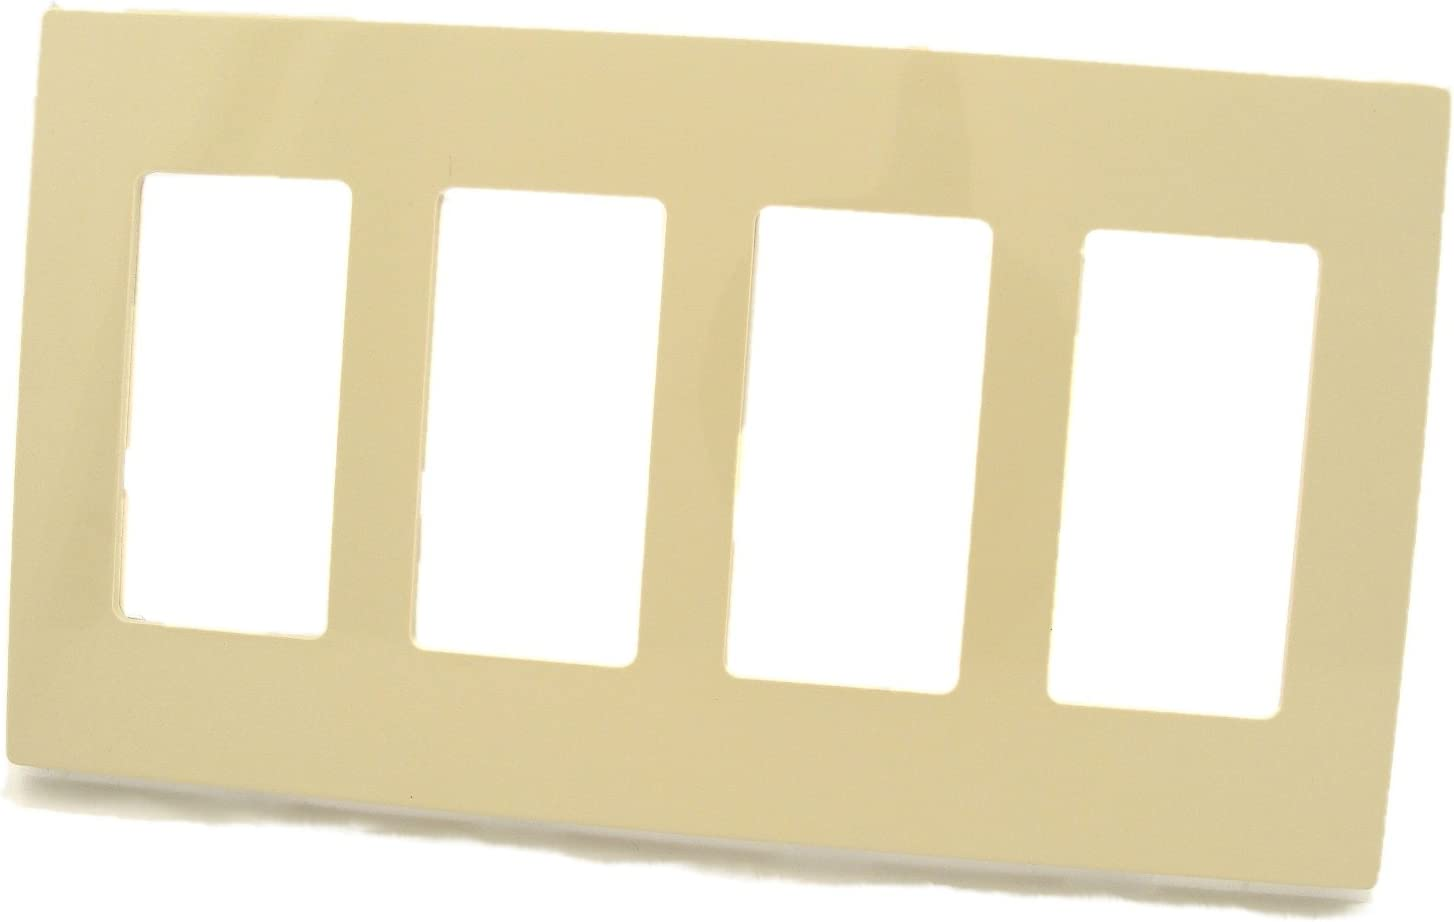 Leviton 80312-SW 4-Gang Decora Plus Wallplate Screwless Snap-On Mount,White